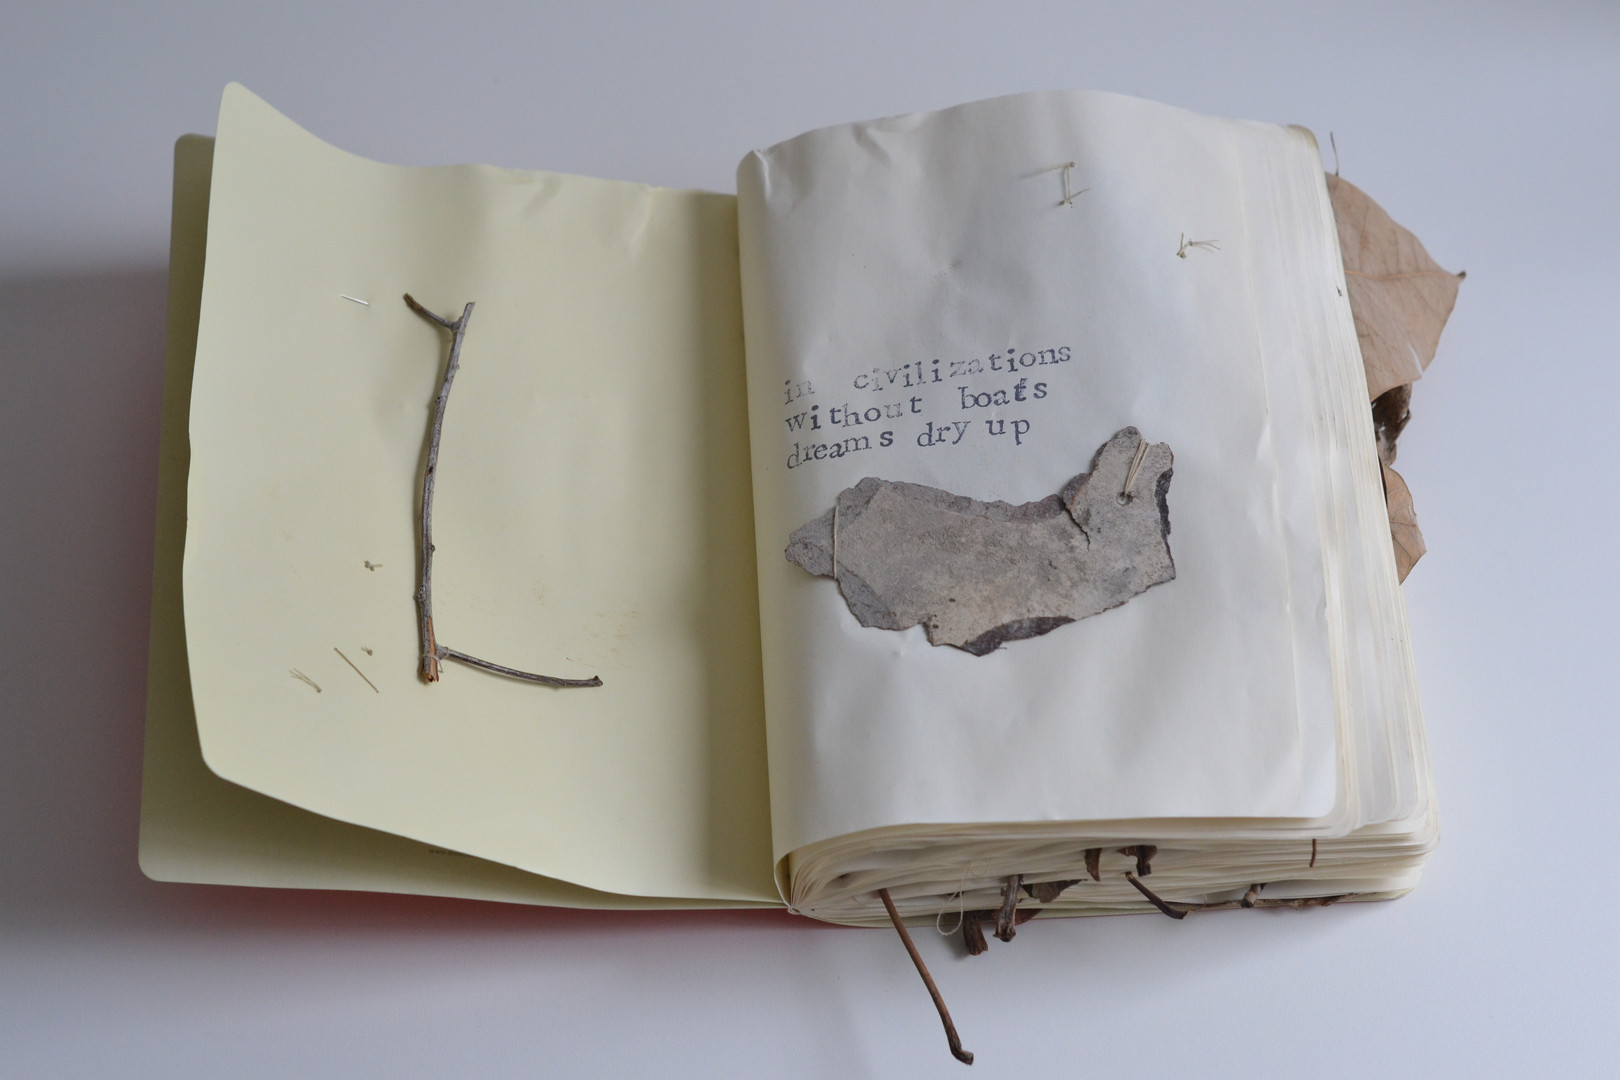 Livro de Artista (Artist book)